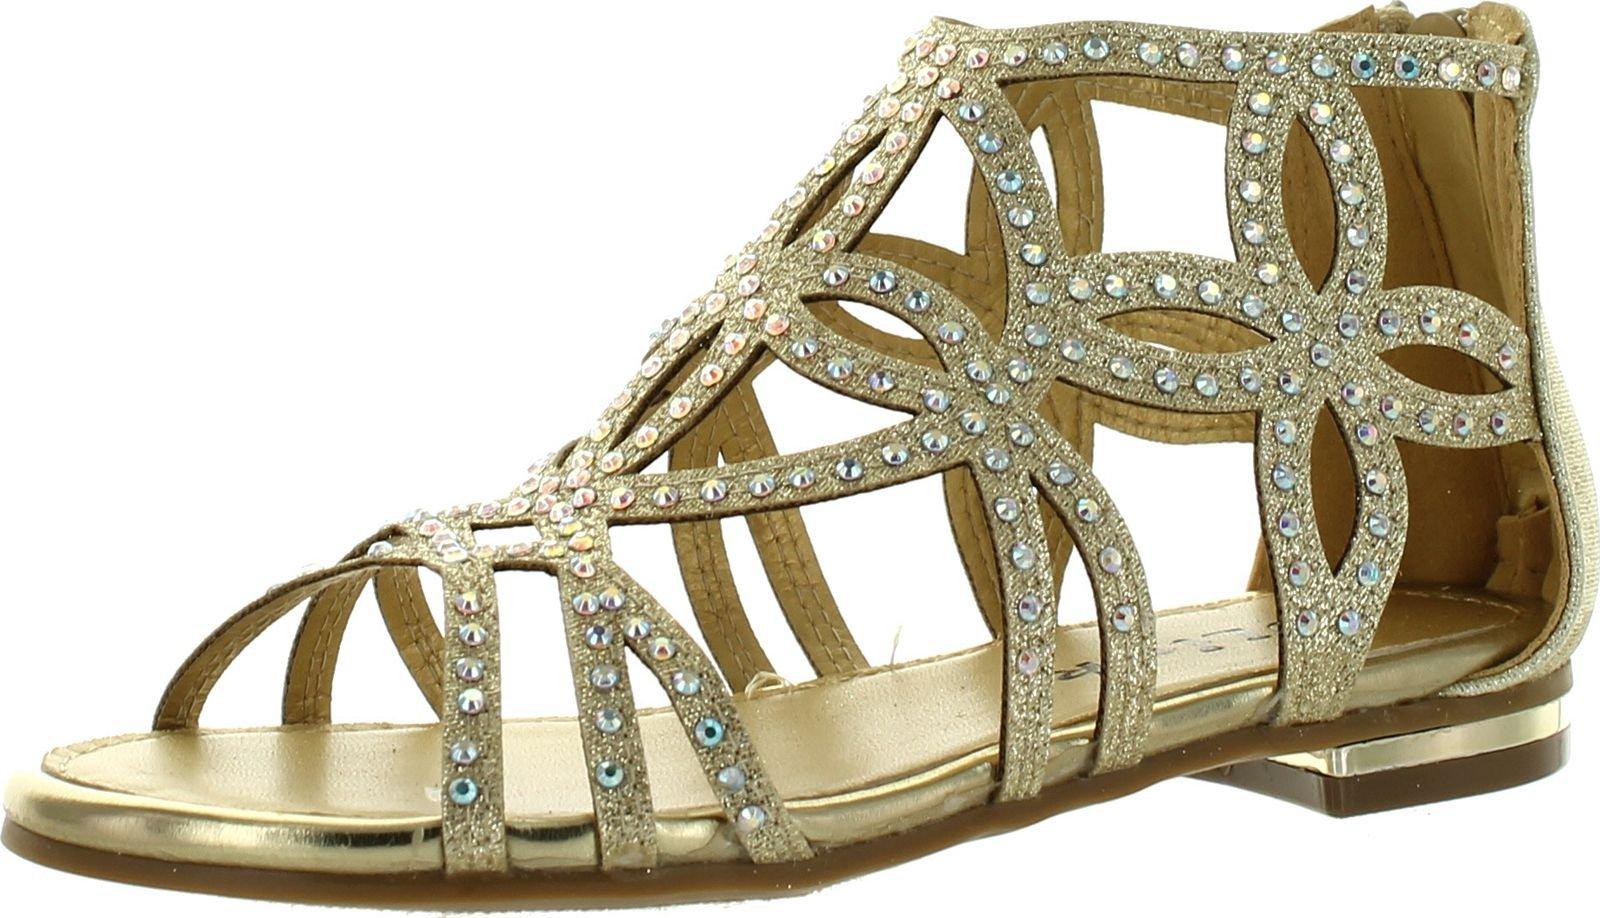 Forever Tory63 Kids Bling Rhinestone Four-Leaf Clover Cut Out Strap Gladiator Dress Sandal Shoes,Gold_T-63K,3